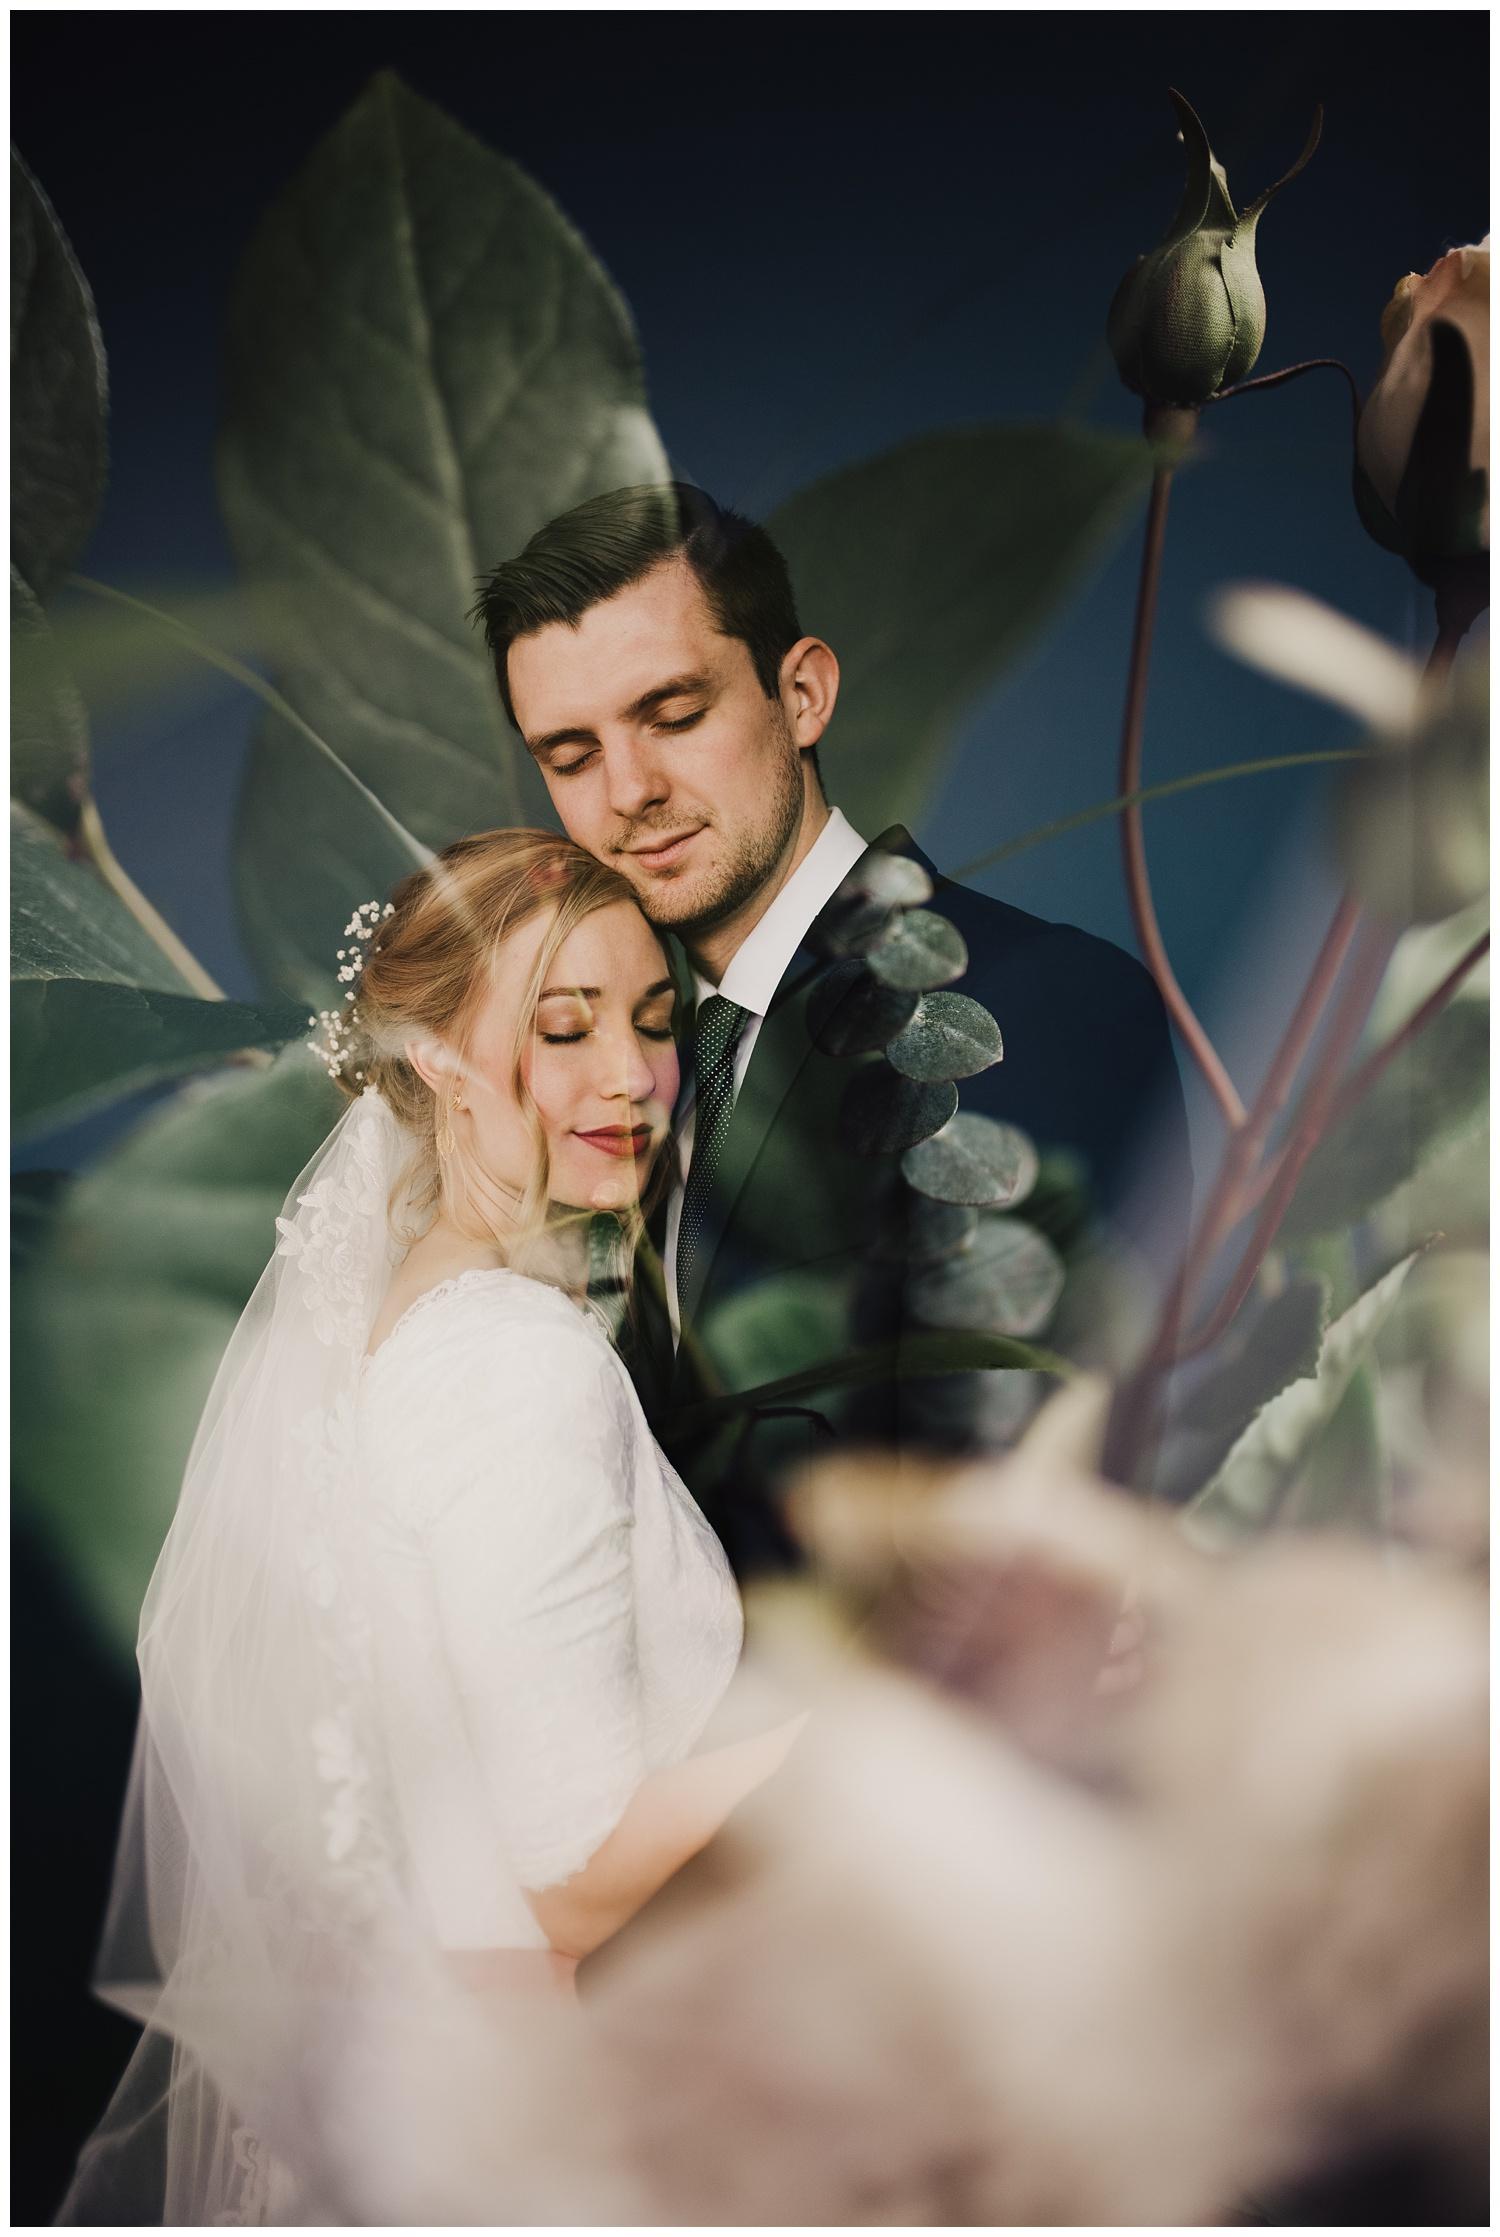 edenstraderphoto-weddingphotographer_0380.jpg